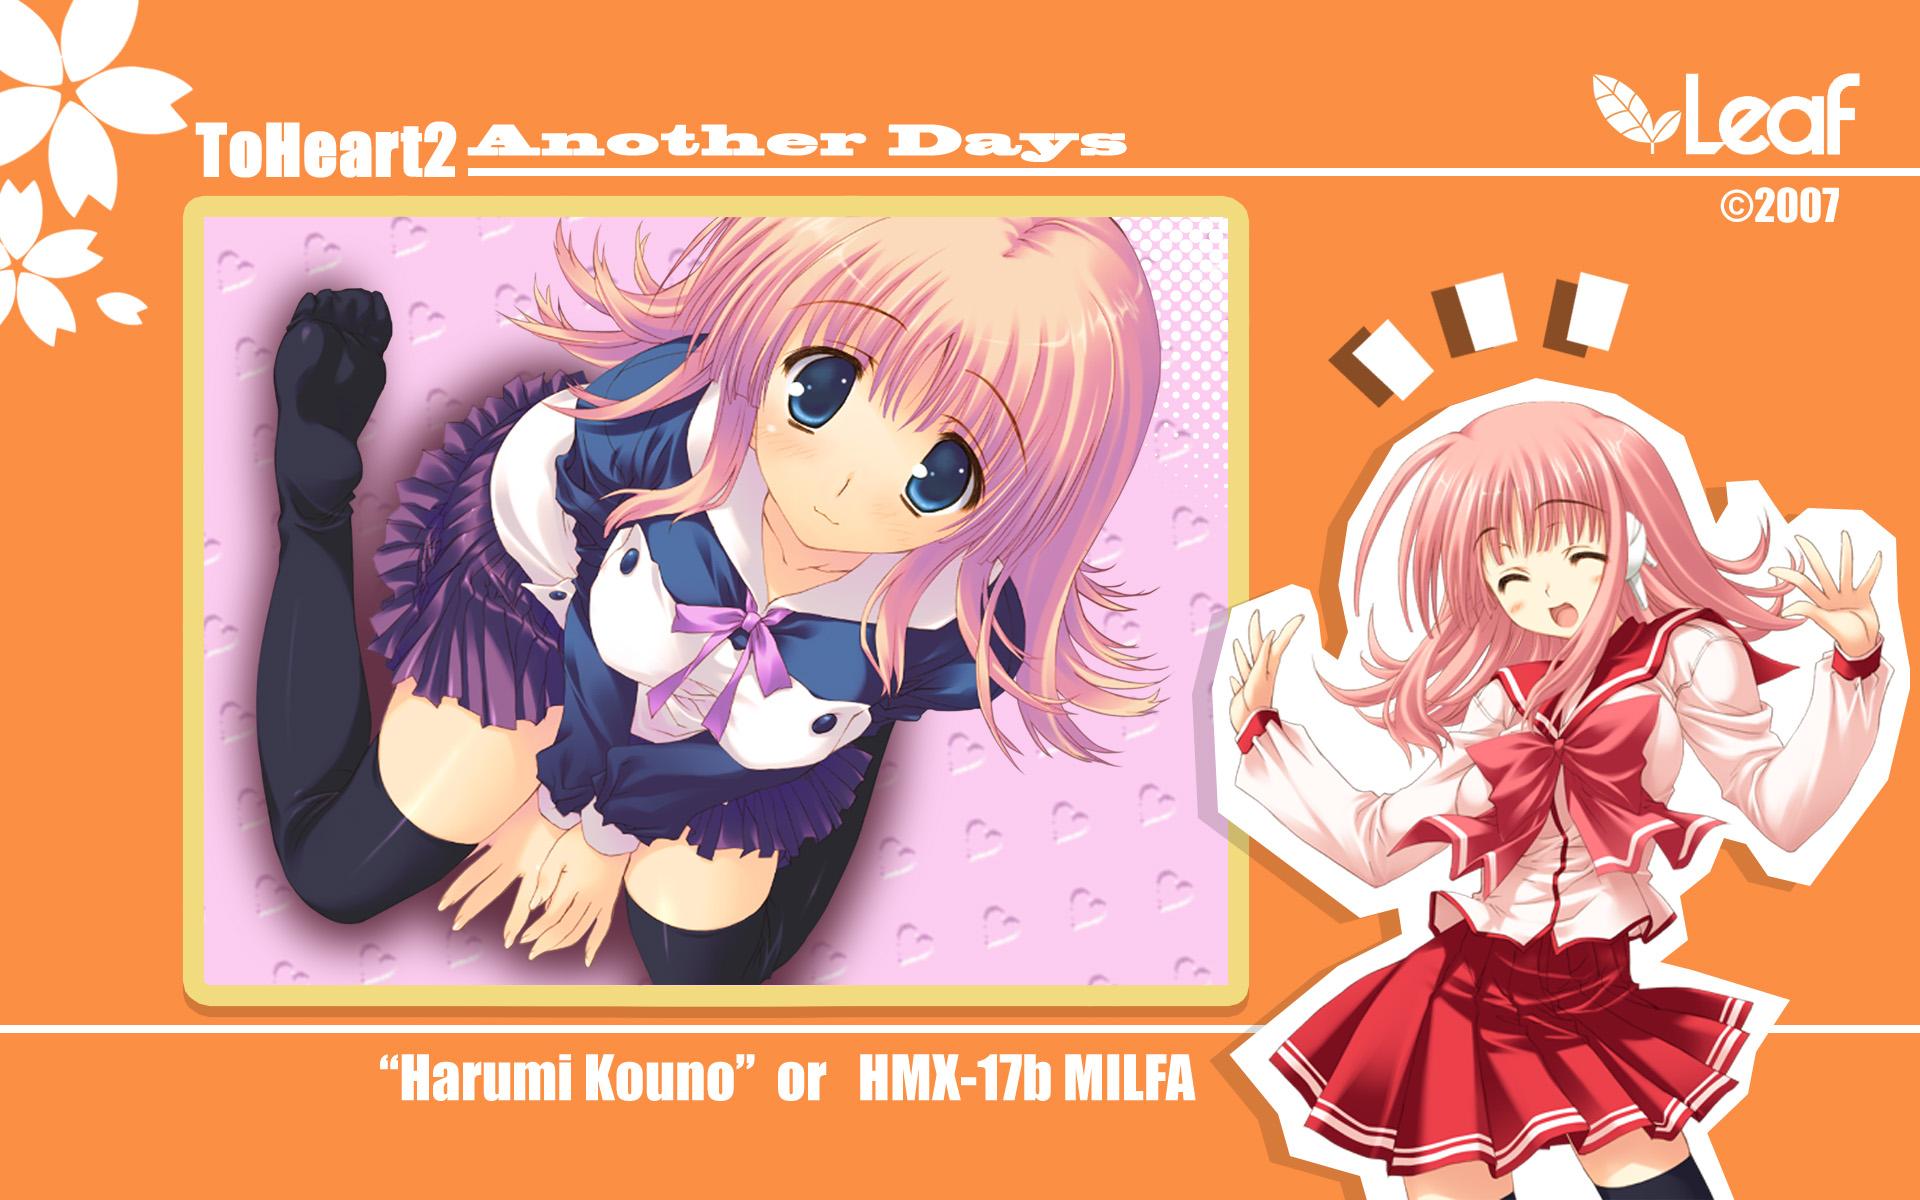 aquaplus kouno_harumi leaf mitsumi_misato to_heart to_heart_2 to_heart_2_another_days